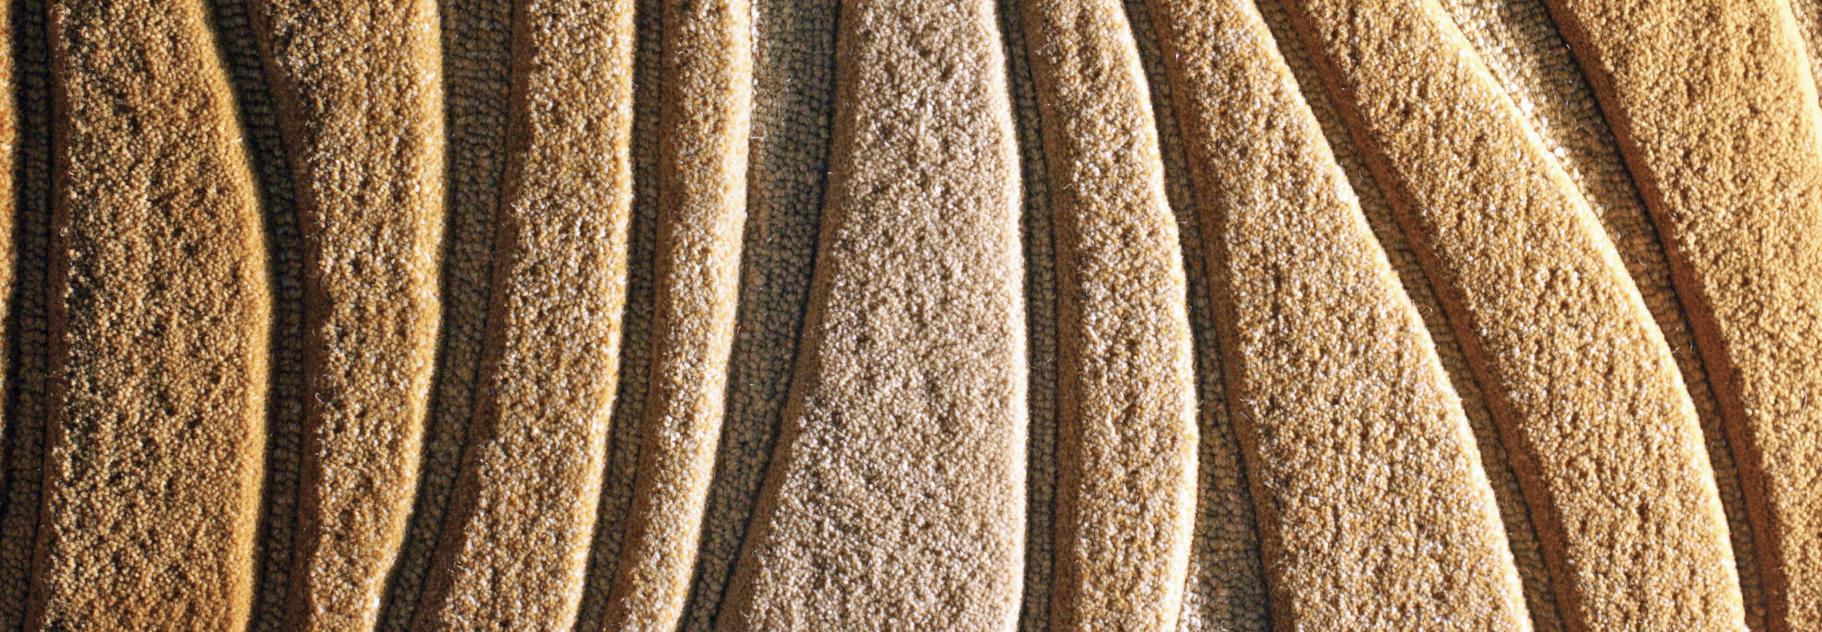 carpet_texture.png